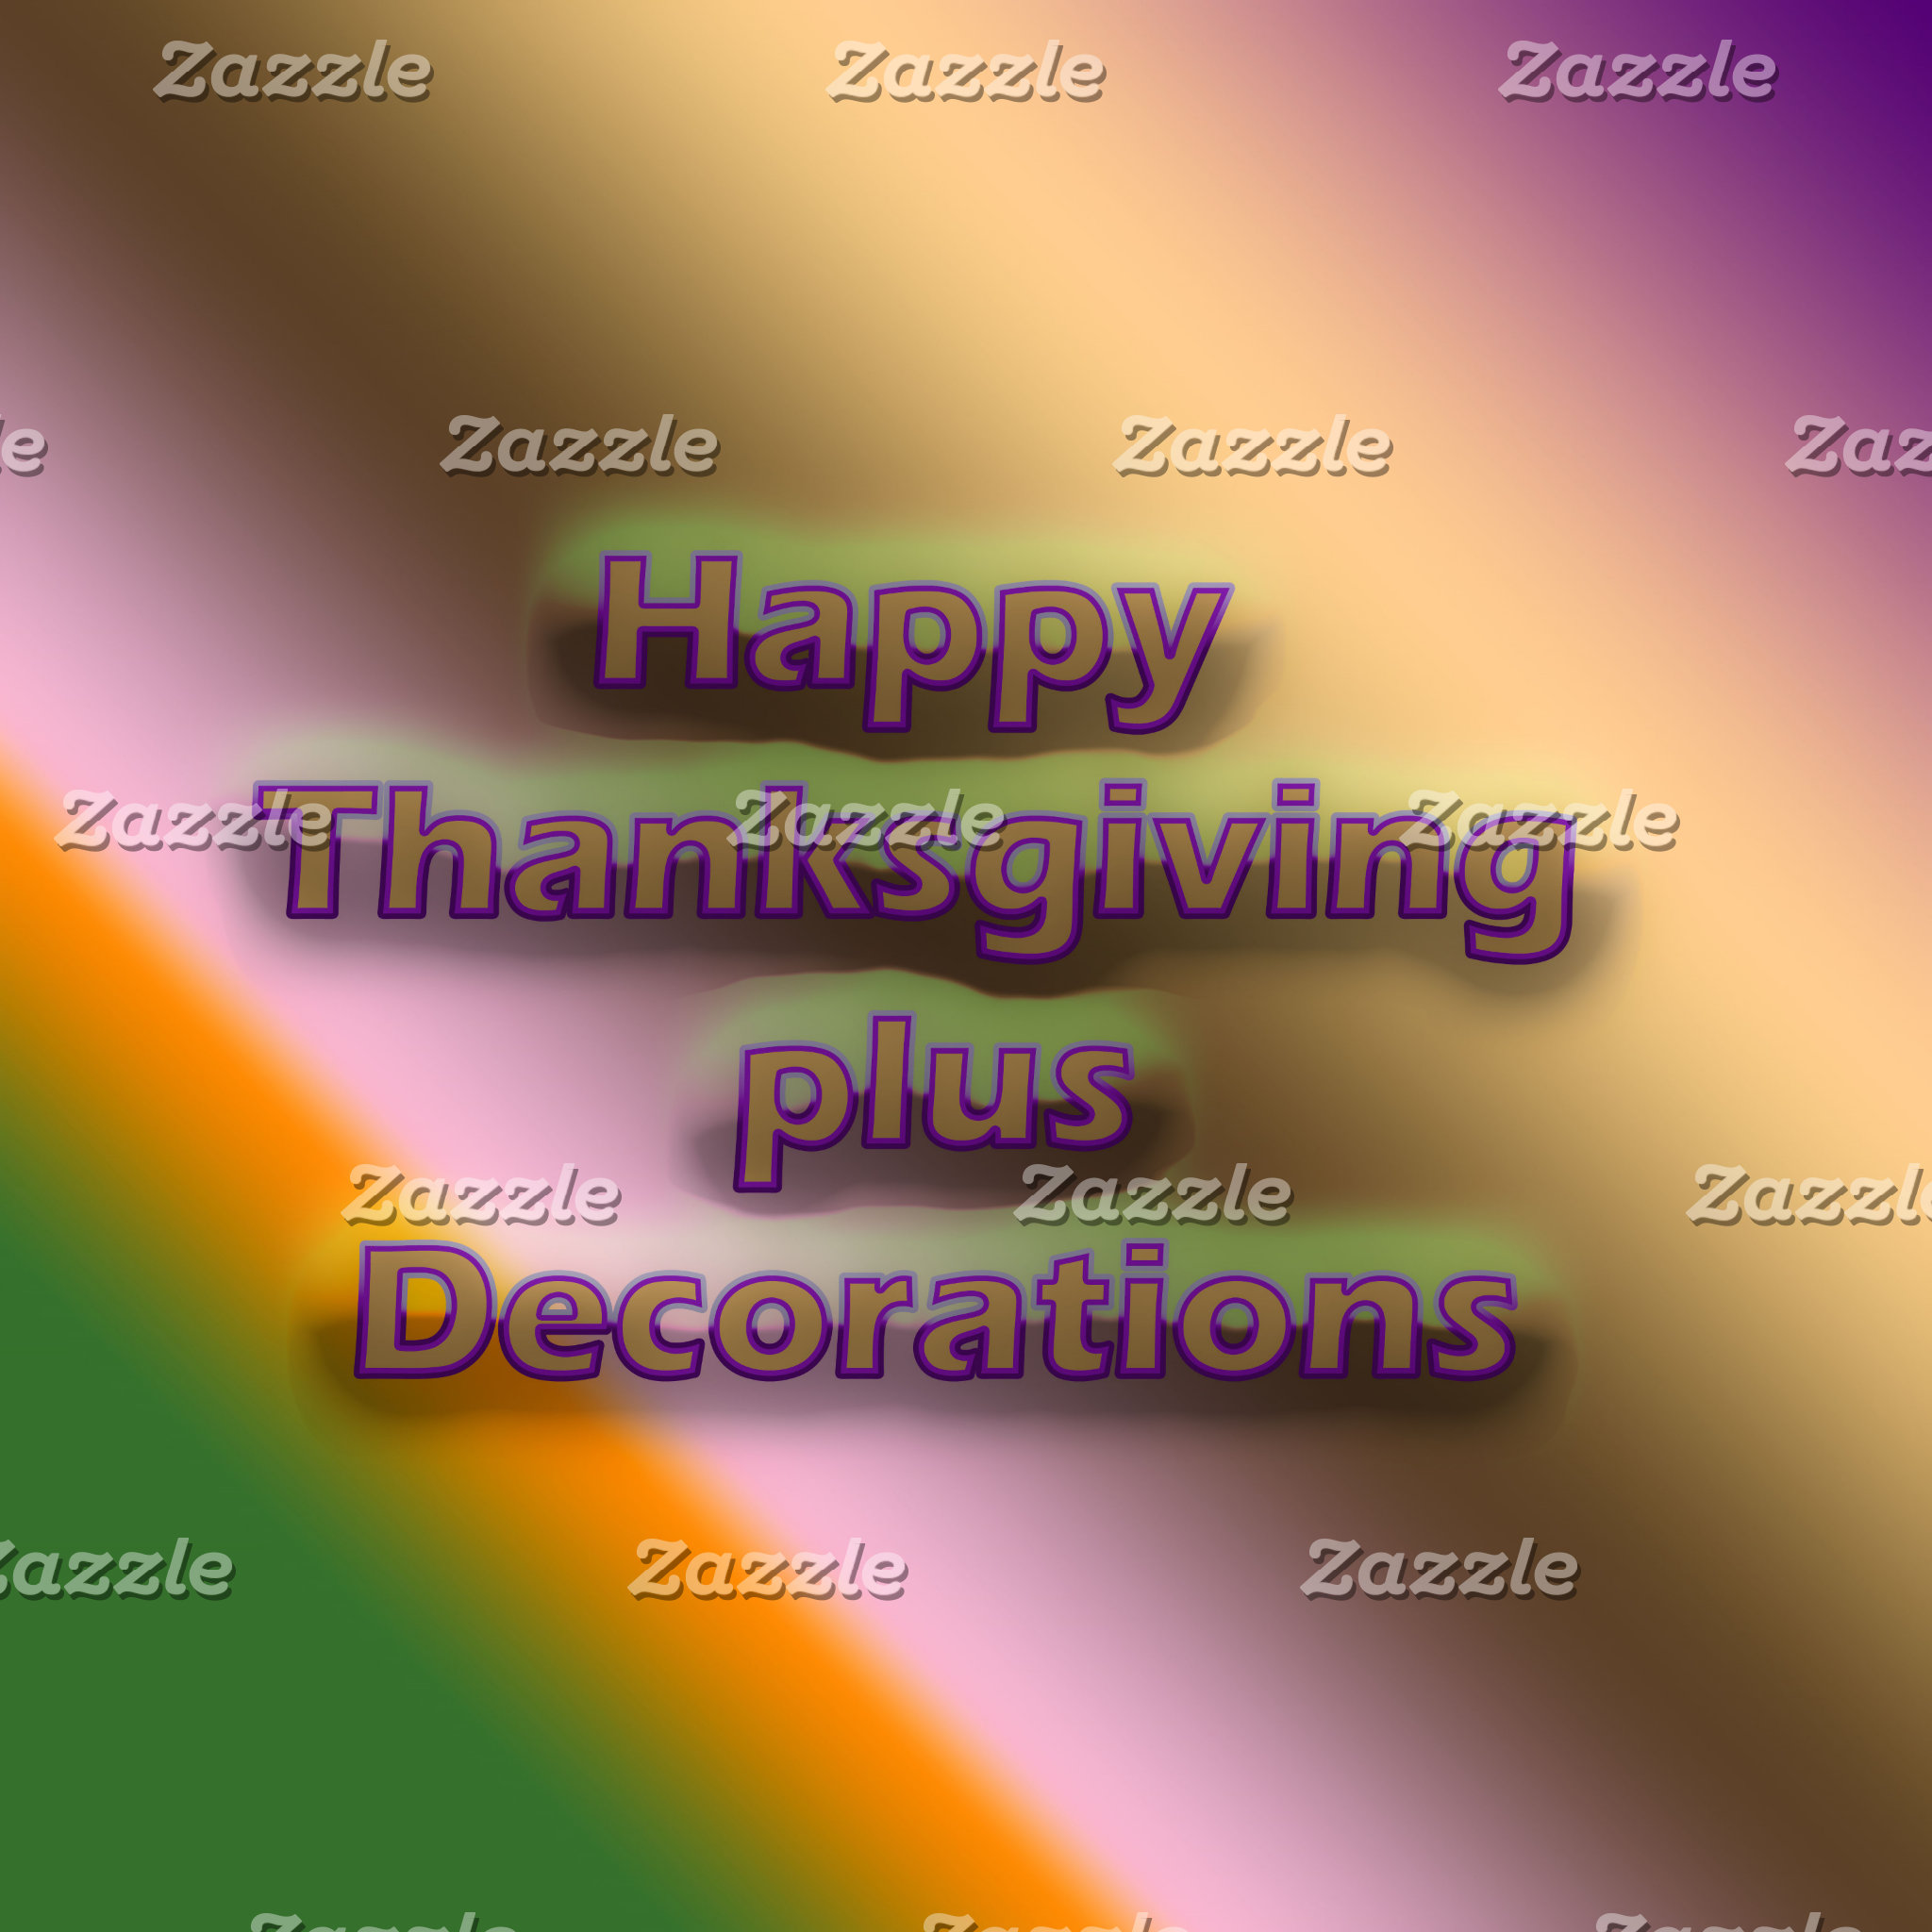 Happy Thanksgiving plus Decorations